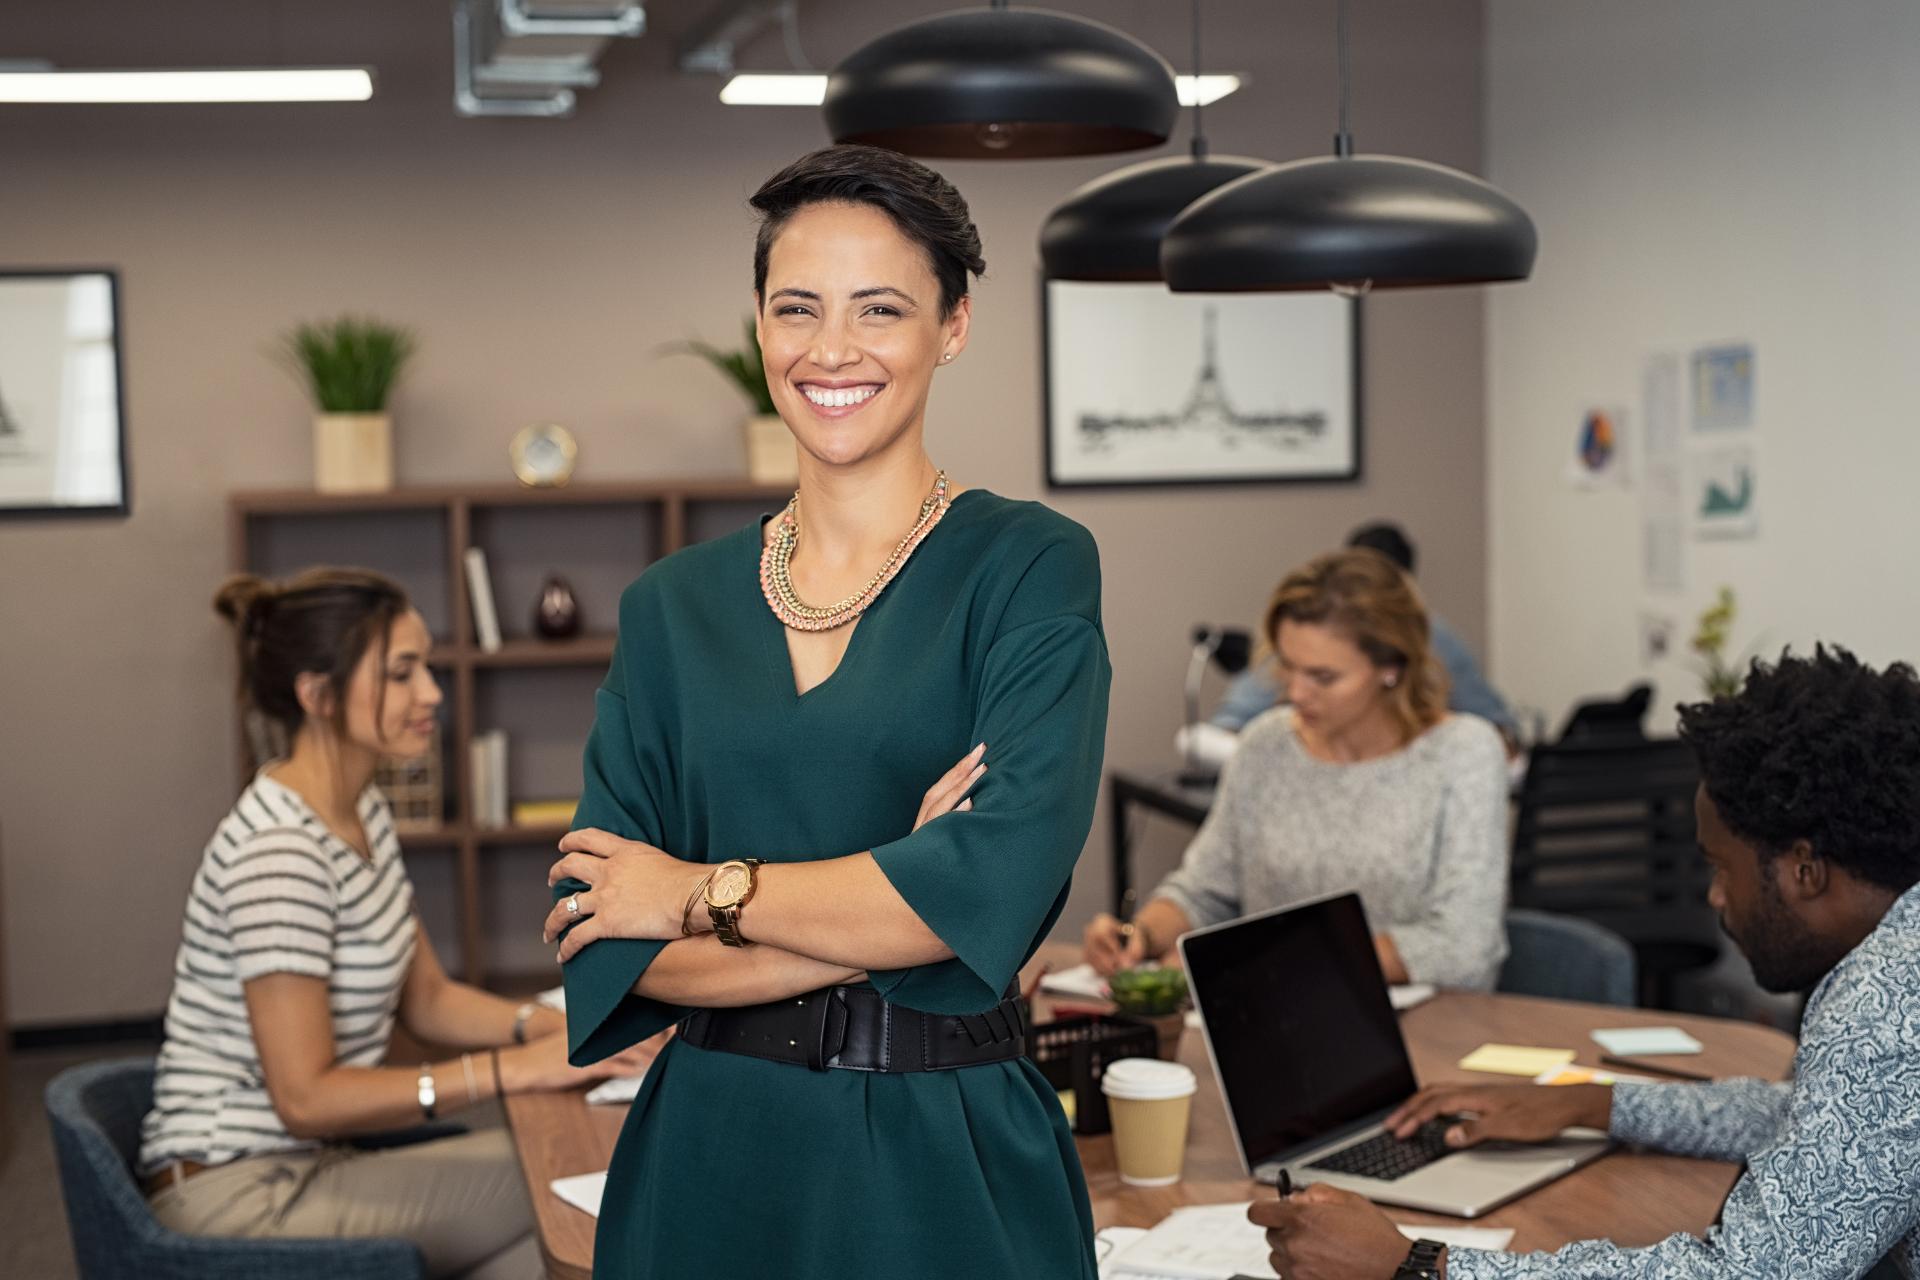 Ausloans finance aggregator marketing support 20